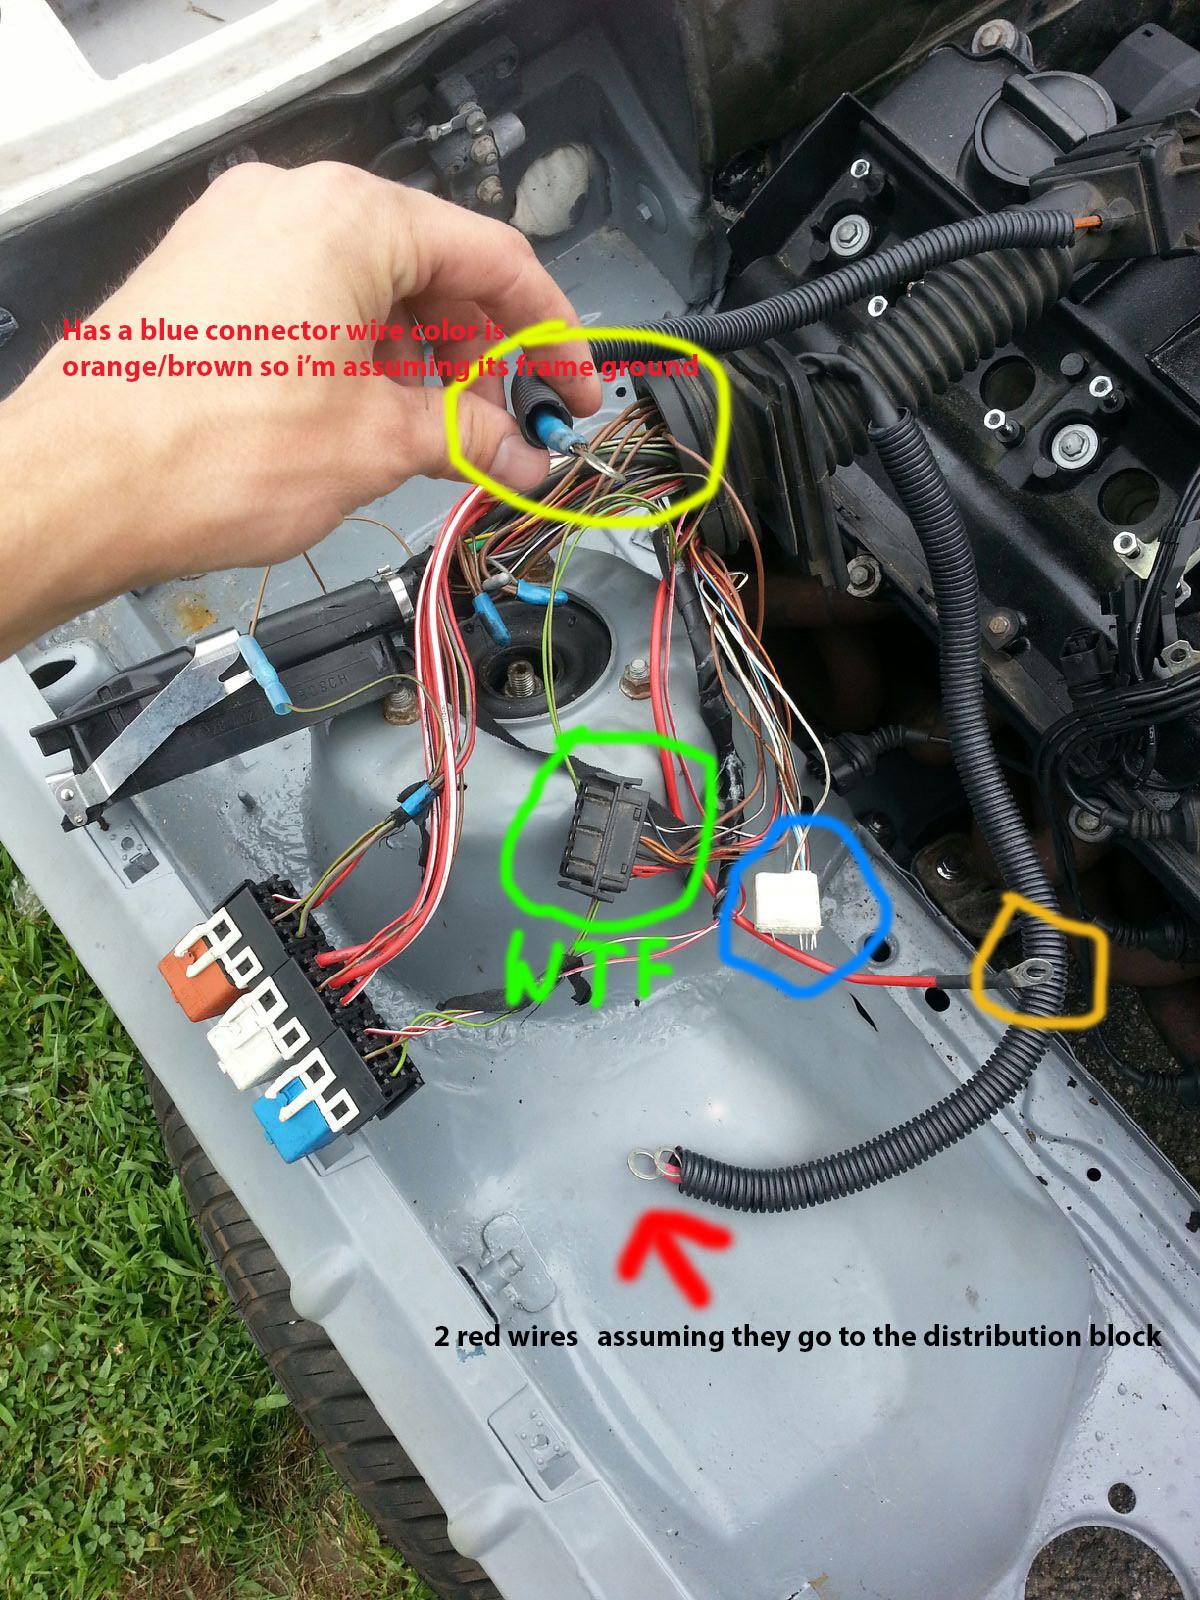 KK_2188] E30 M50 Swap Wiring Schematic WiringMonoc Isra Mohammedshrine Librar Wiring 101